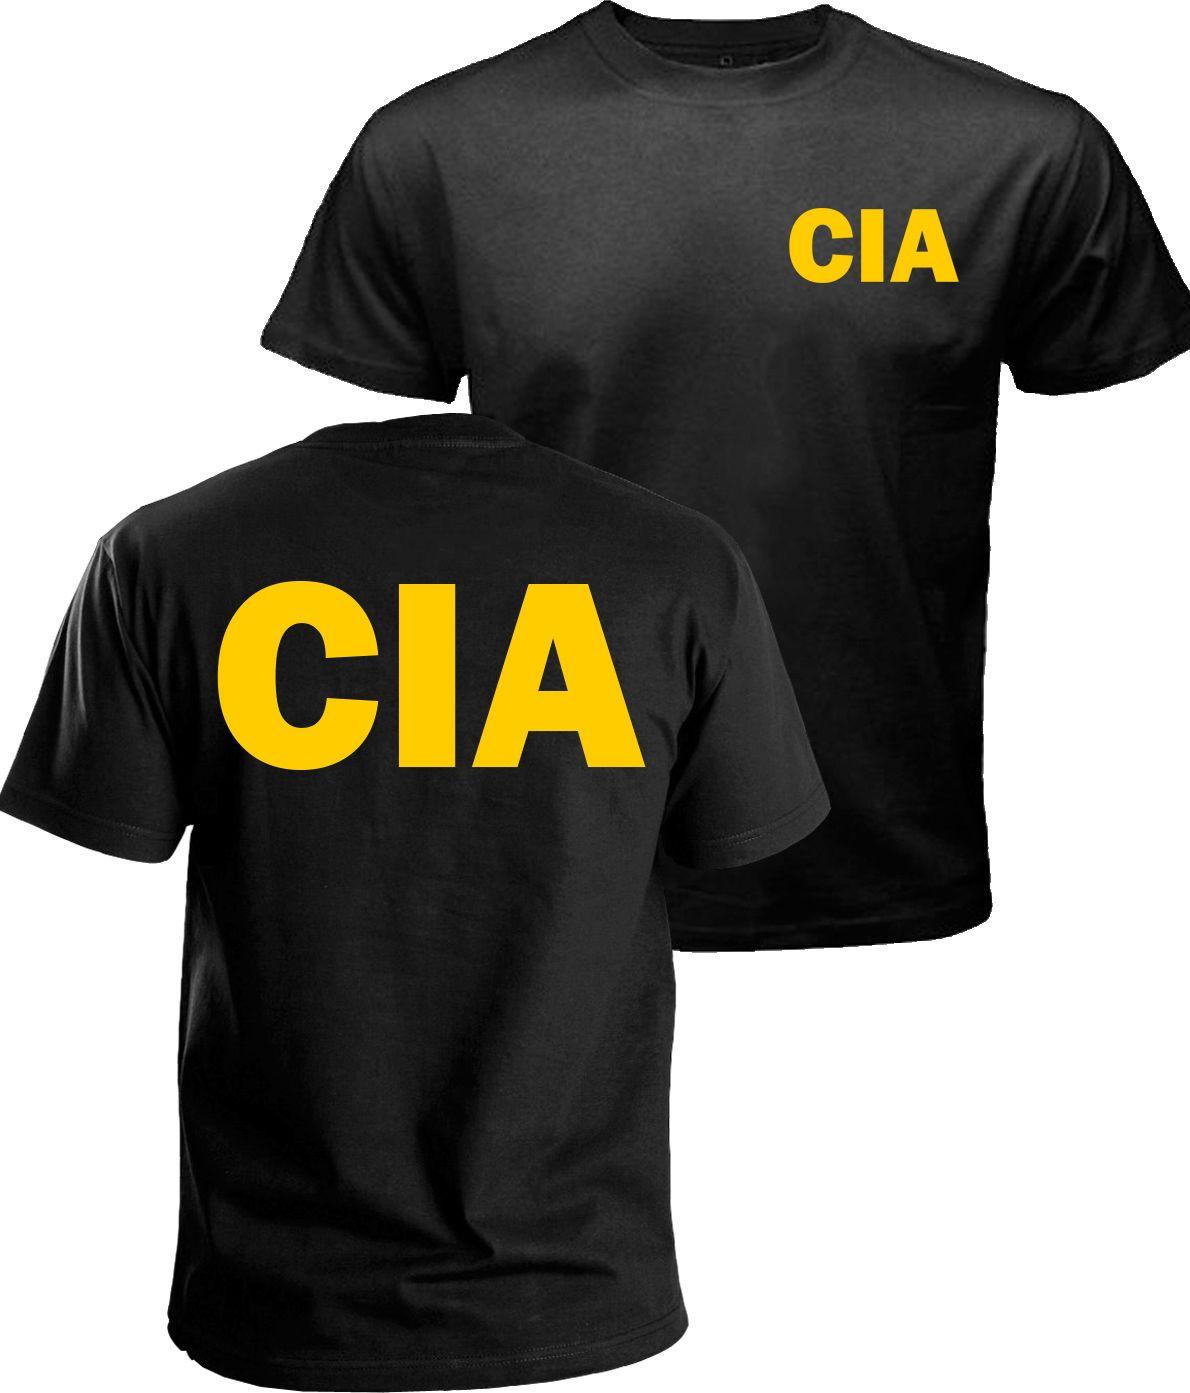 CIA Tshirt Government Agent T-shirt Secret Service Police FBI Men Tops  Printed Tee